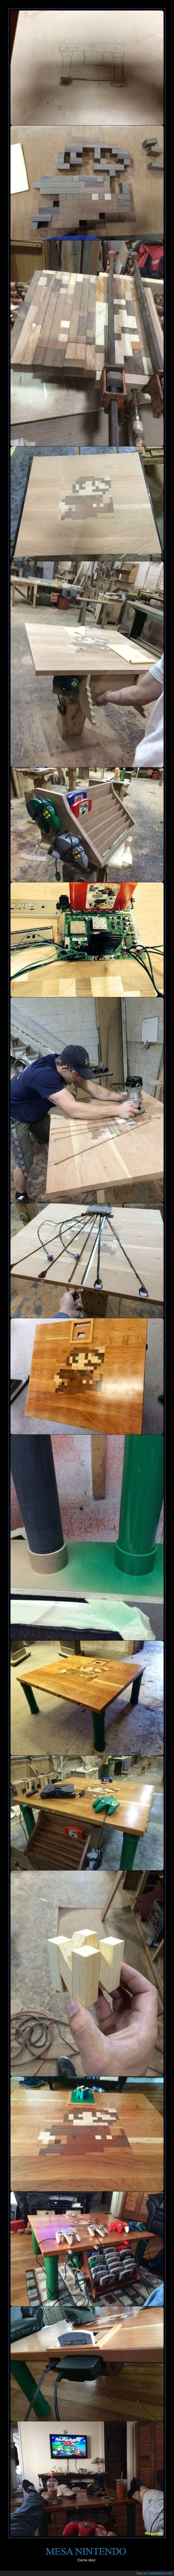 handmade,juego,madera,mario,mesa,N64,nintendo,nintendo 64